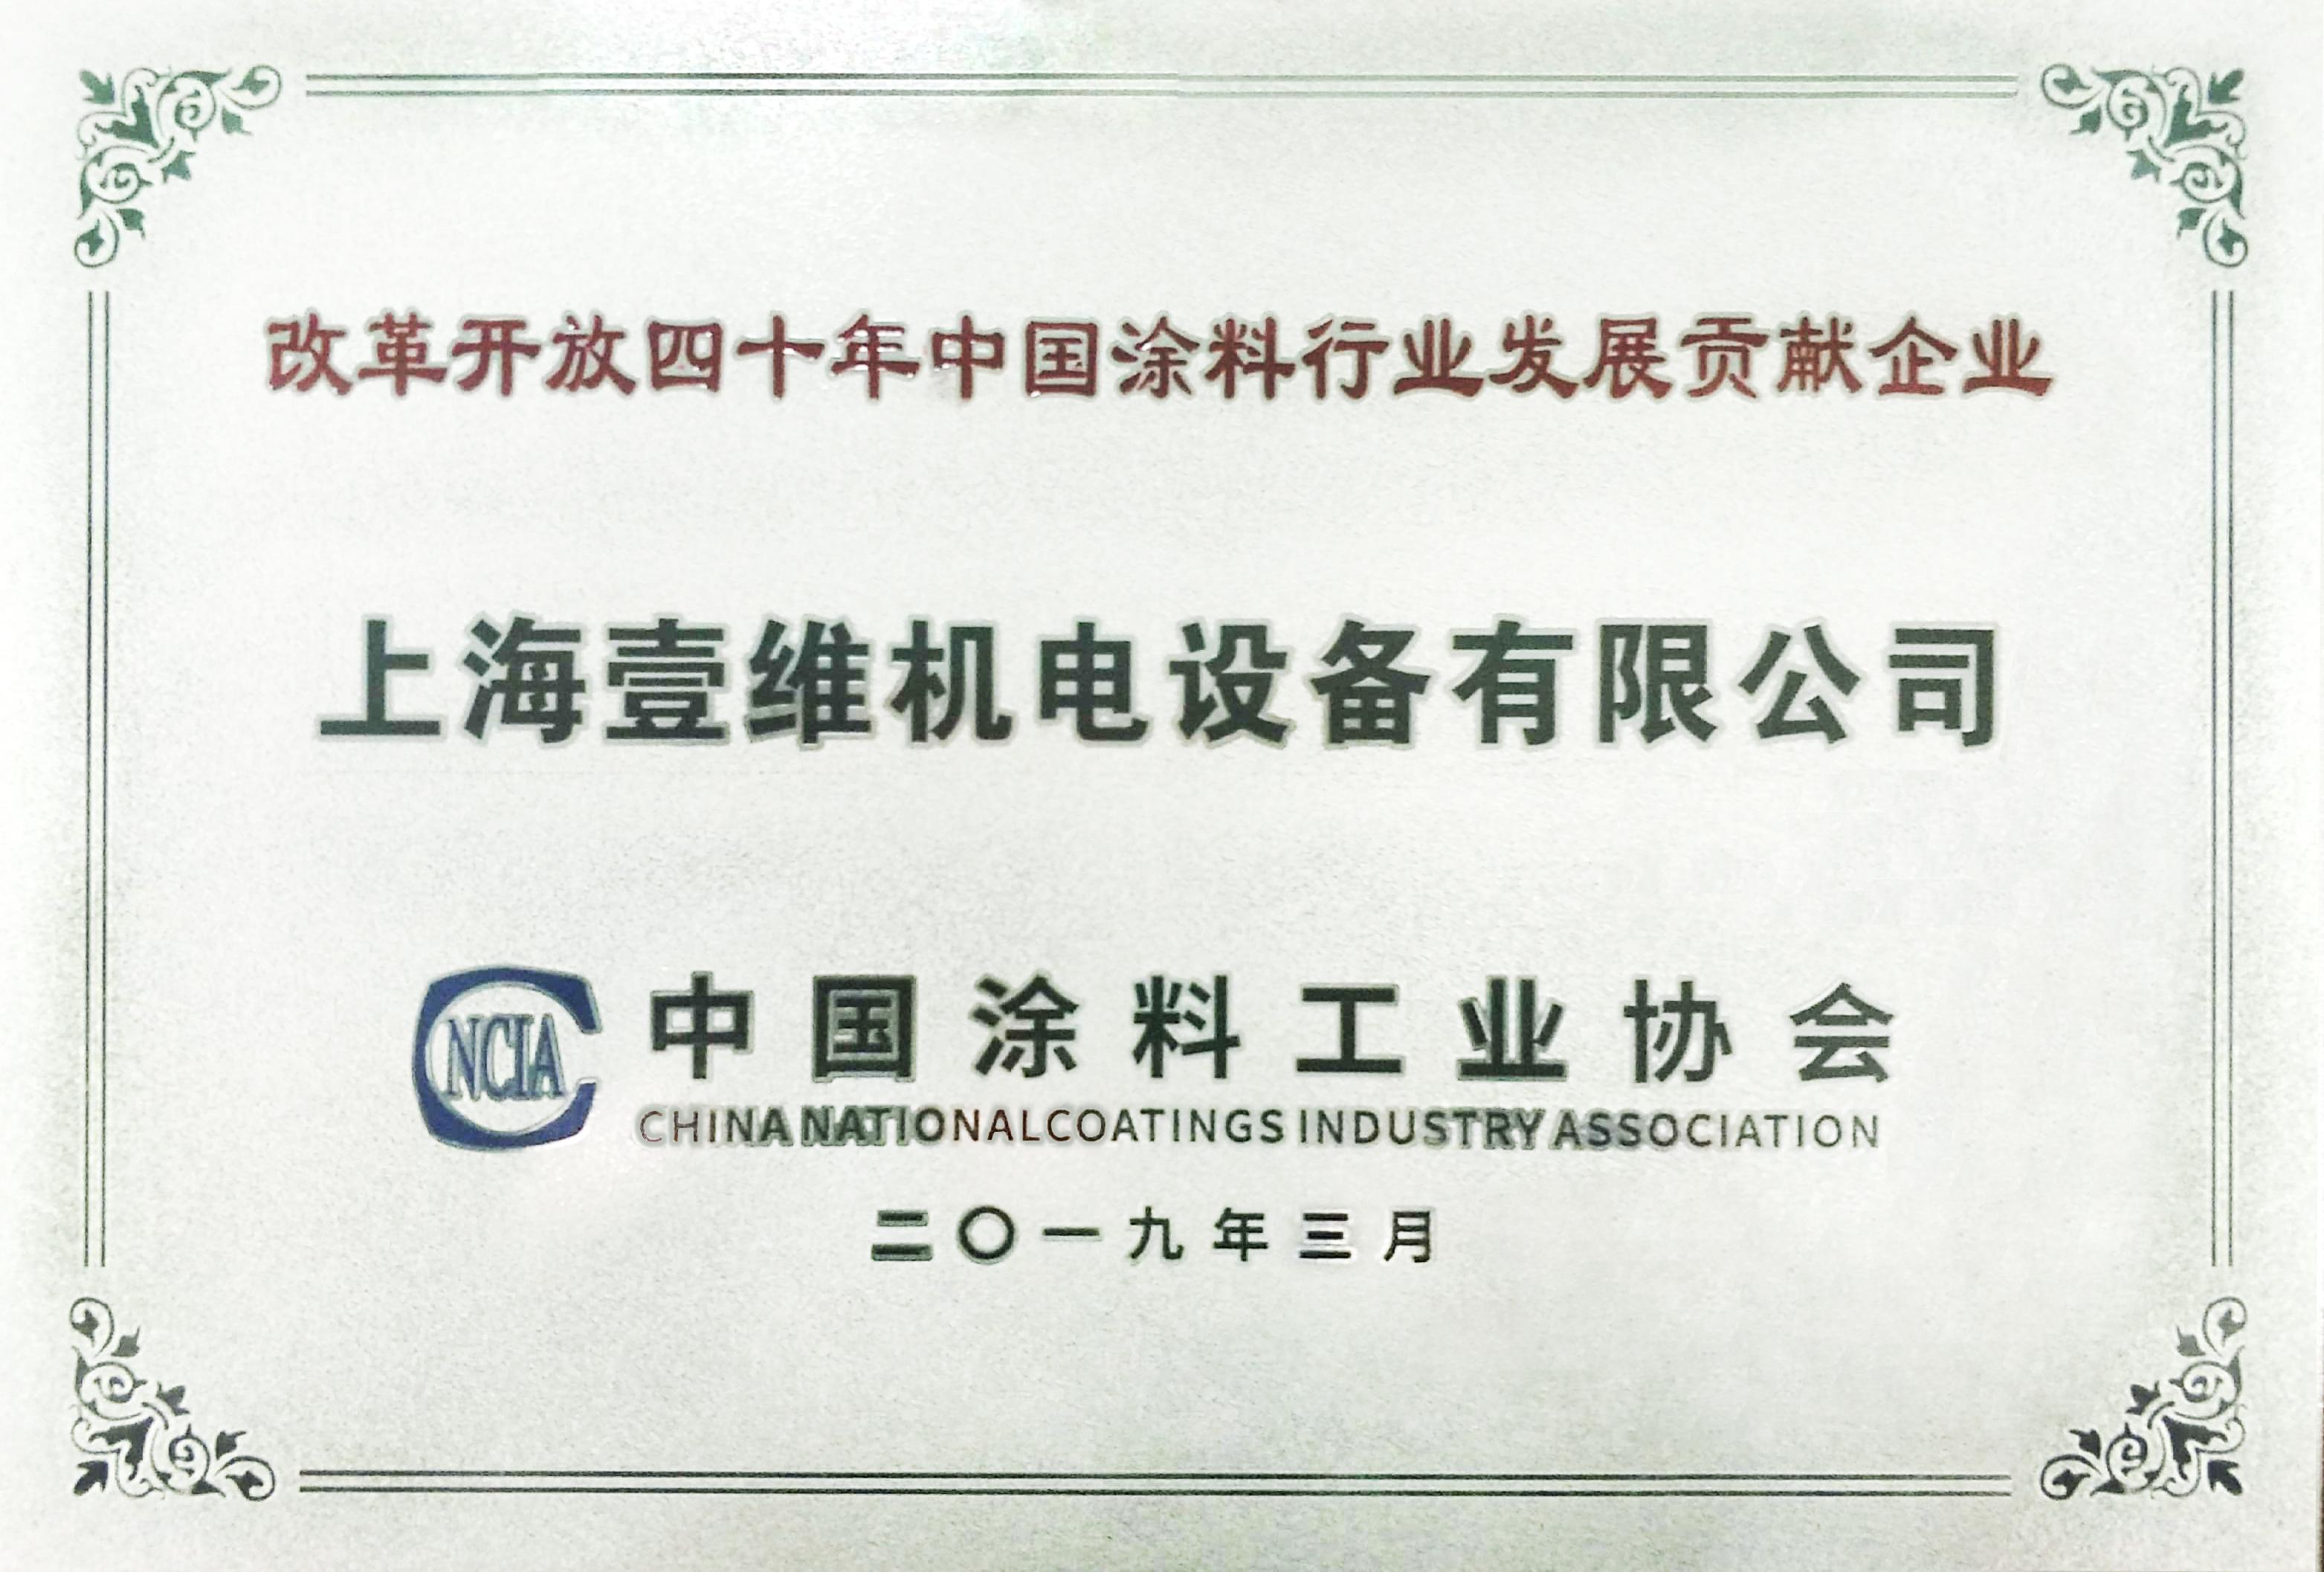 "SOWER獲得""改革開放四十年中國涂料行業發展貢獻企業"" 的榮譽!"